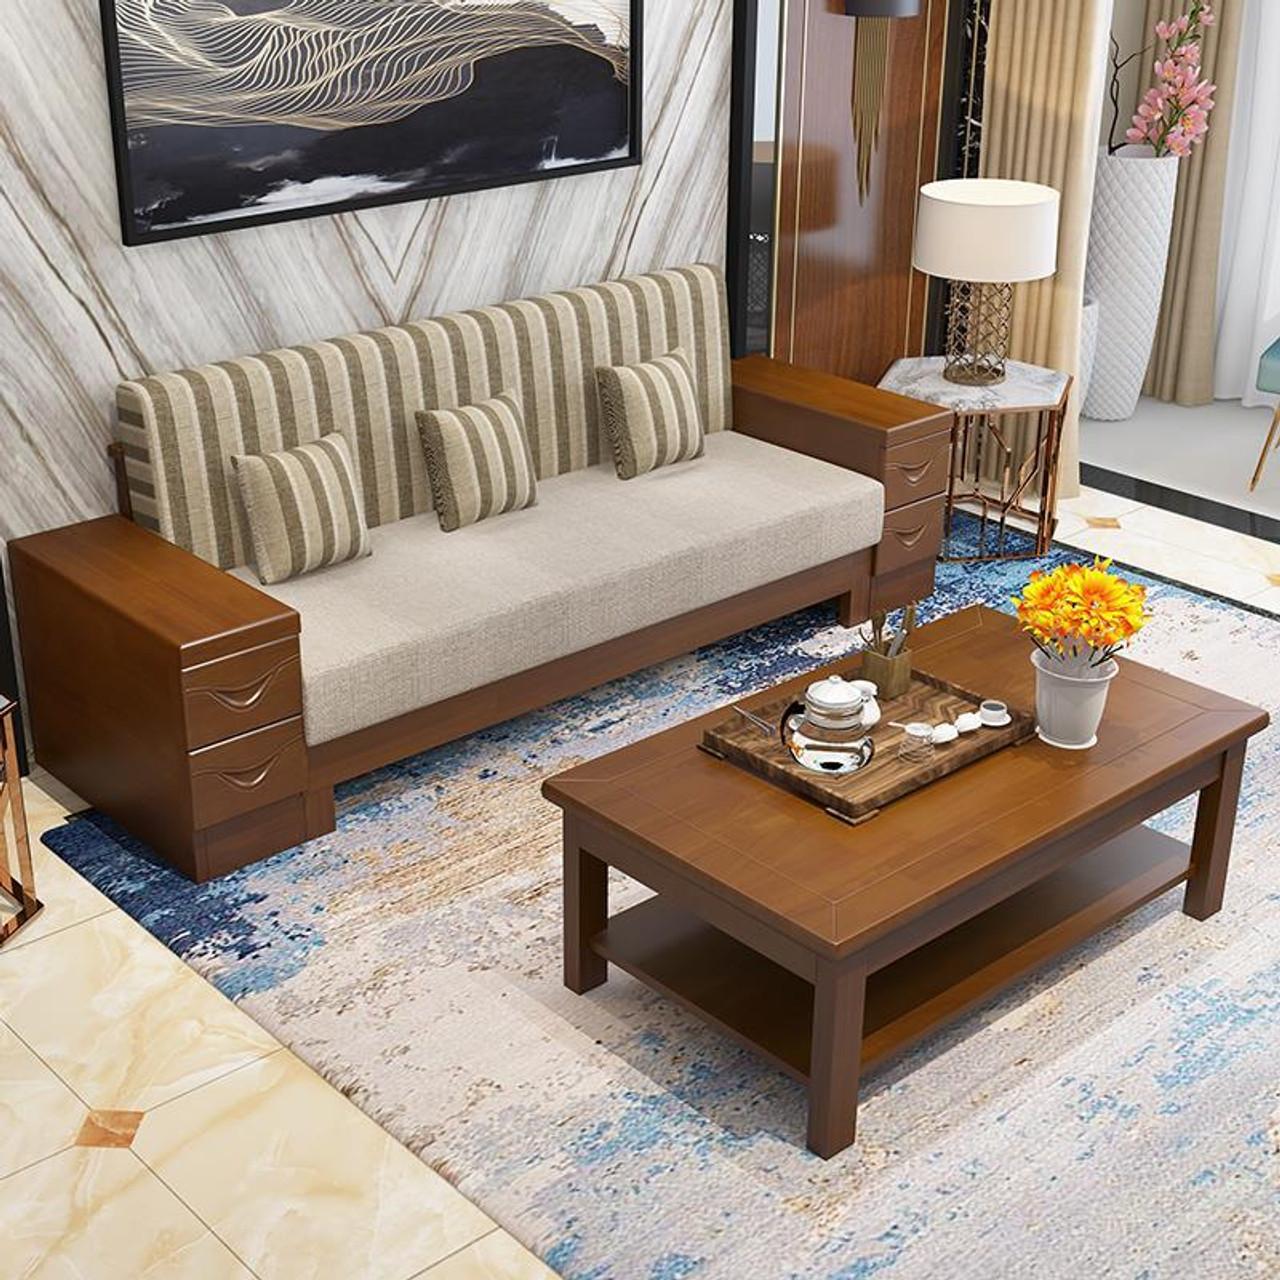 Koltuk Takimi Sillon Home Meuble Maison Meubel Meble Do Salonu Para Wood Vintage De Sala Mueble Set Living Room Furniture Sofa Onshopdeals Com